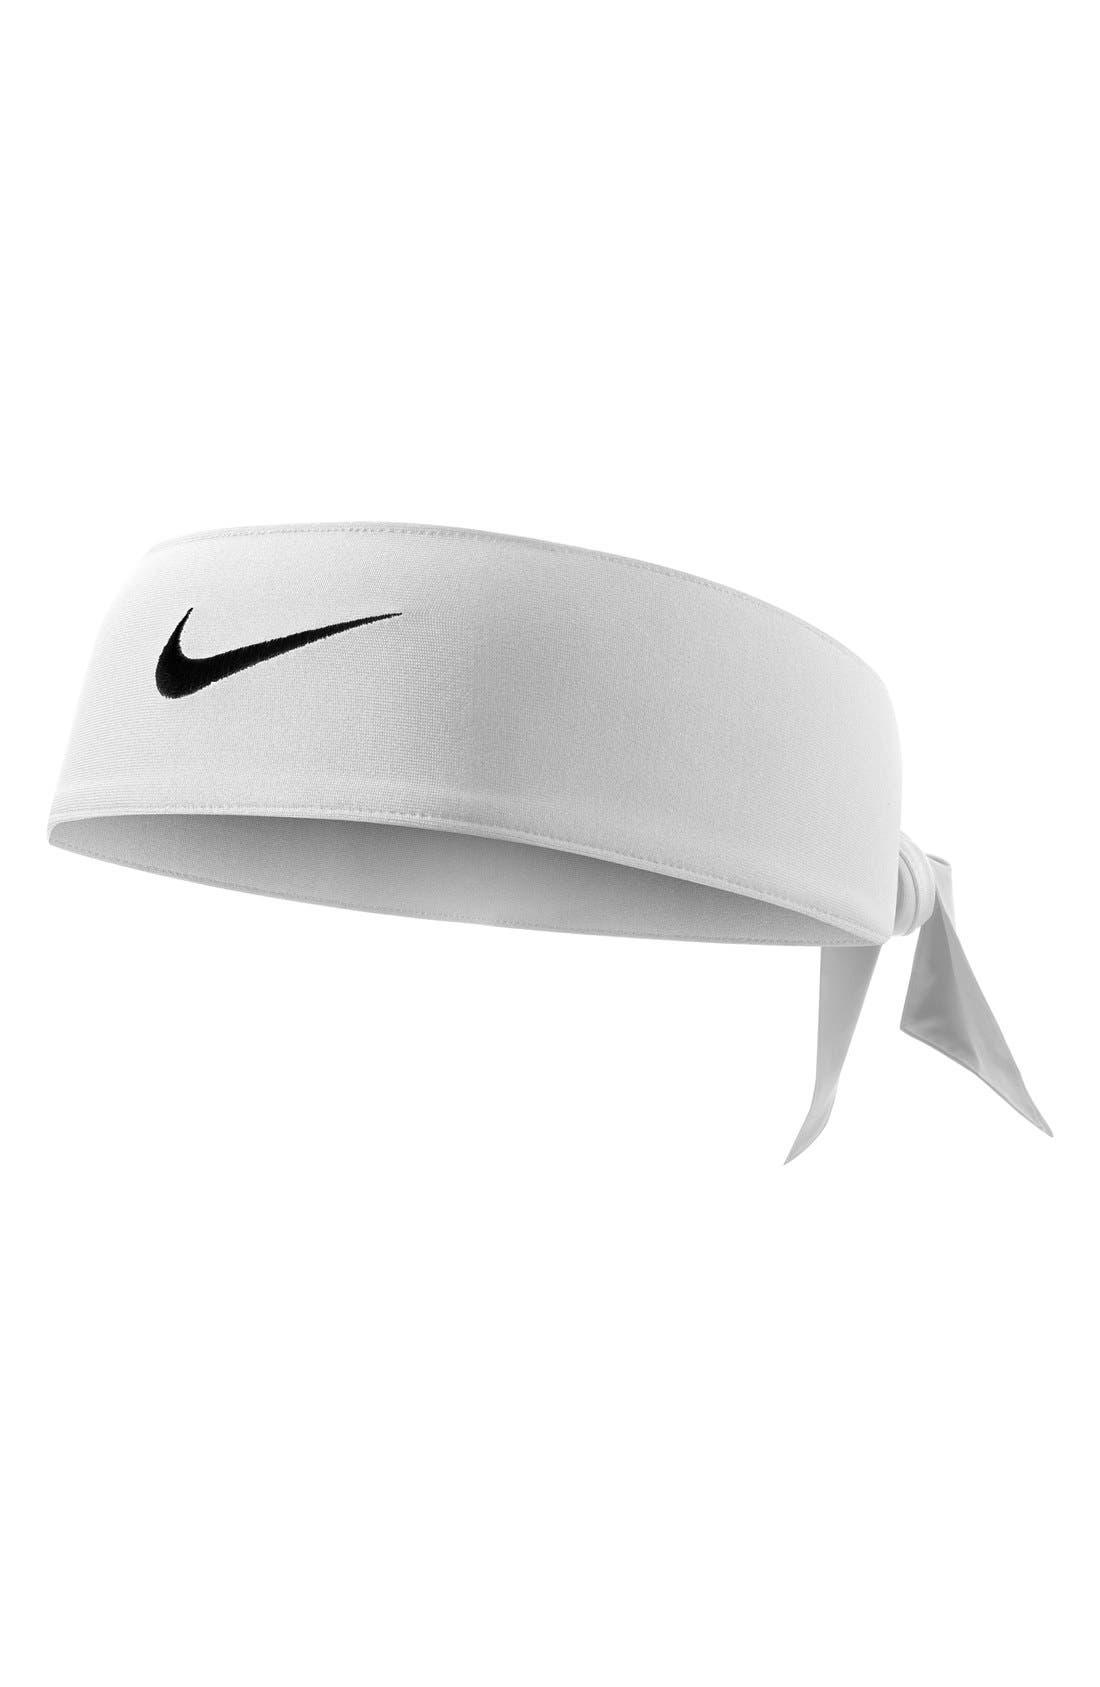 Main Image - Nike 'Head Tie 2.0' Headband